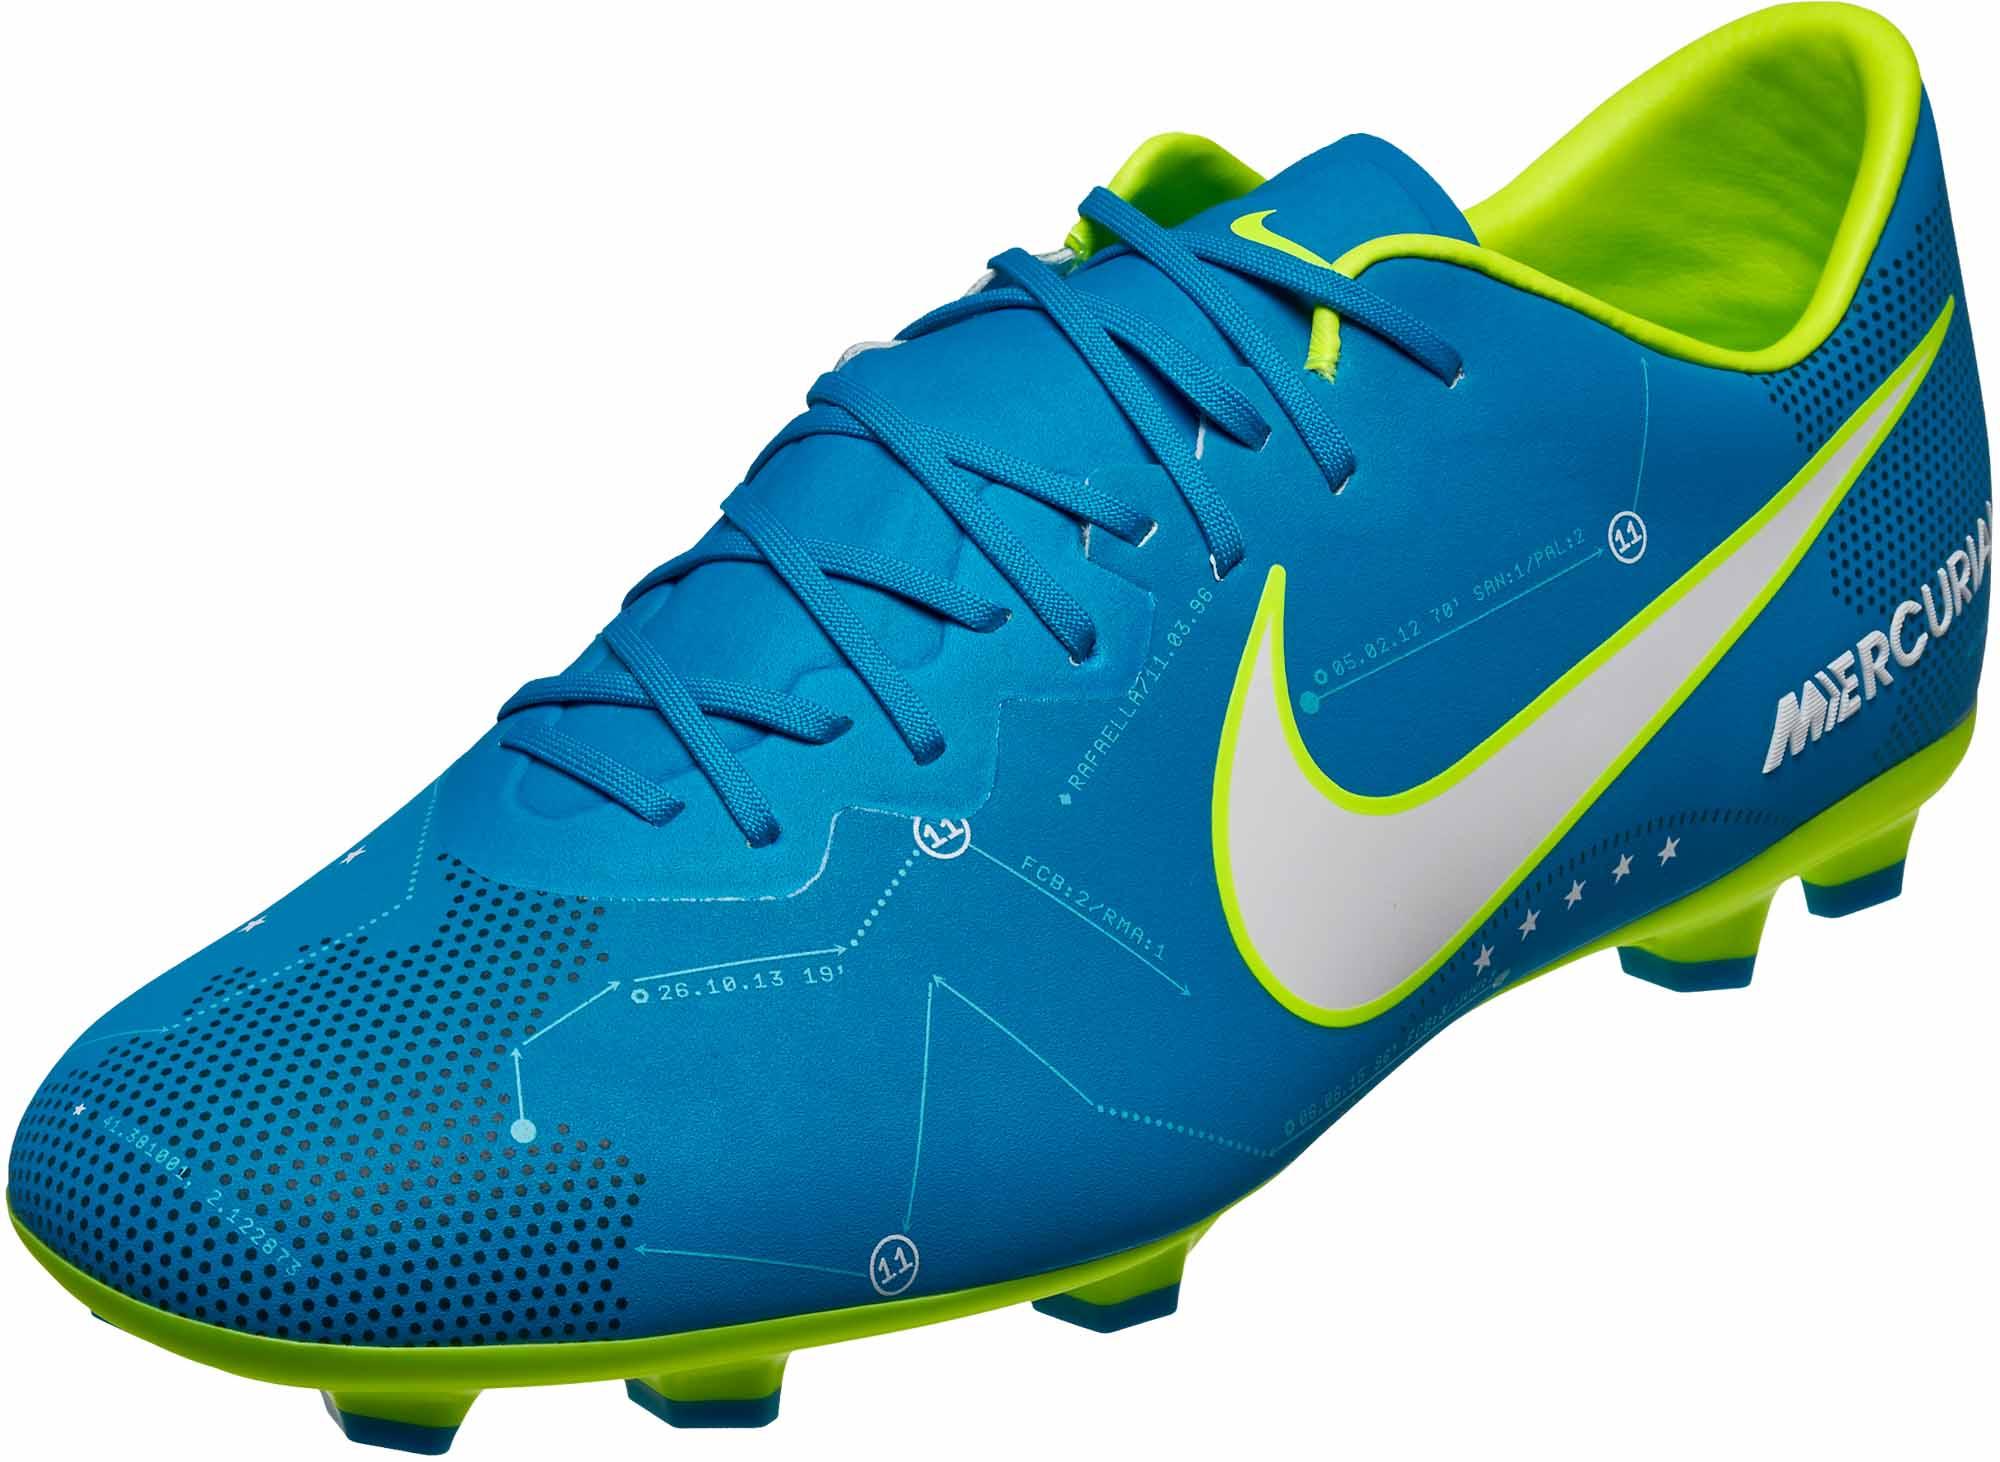 meet e0ab6 5bd11 Nike Kids Mercurial Vapor XI SX FG – Neymar – Blue Orbit/White